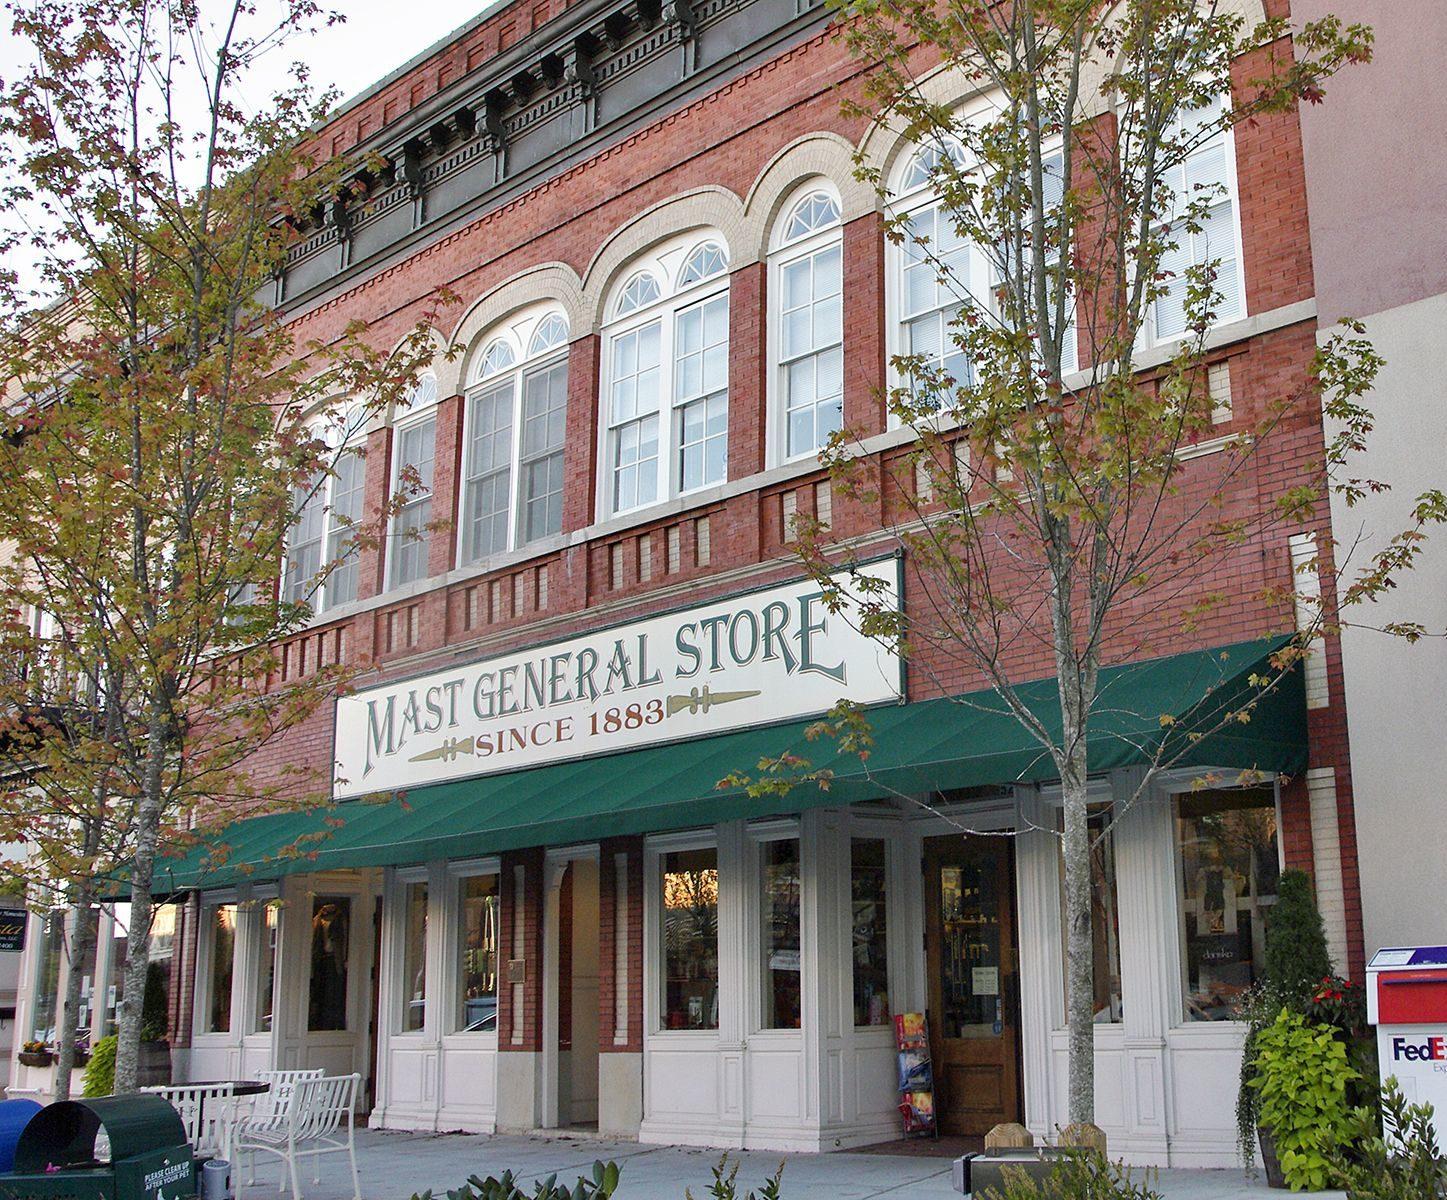 Mast General Store in Hendersonville.